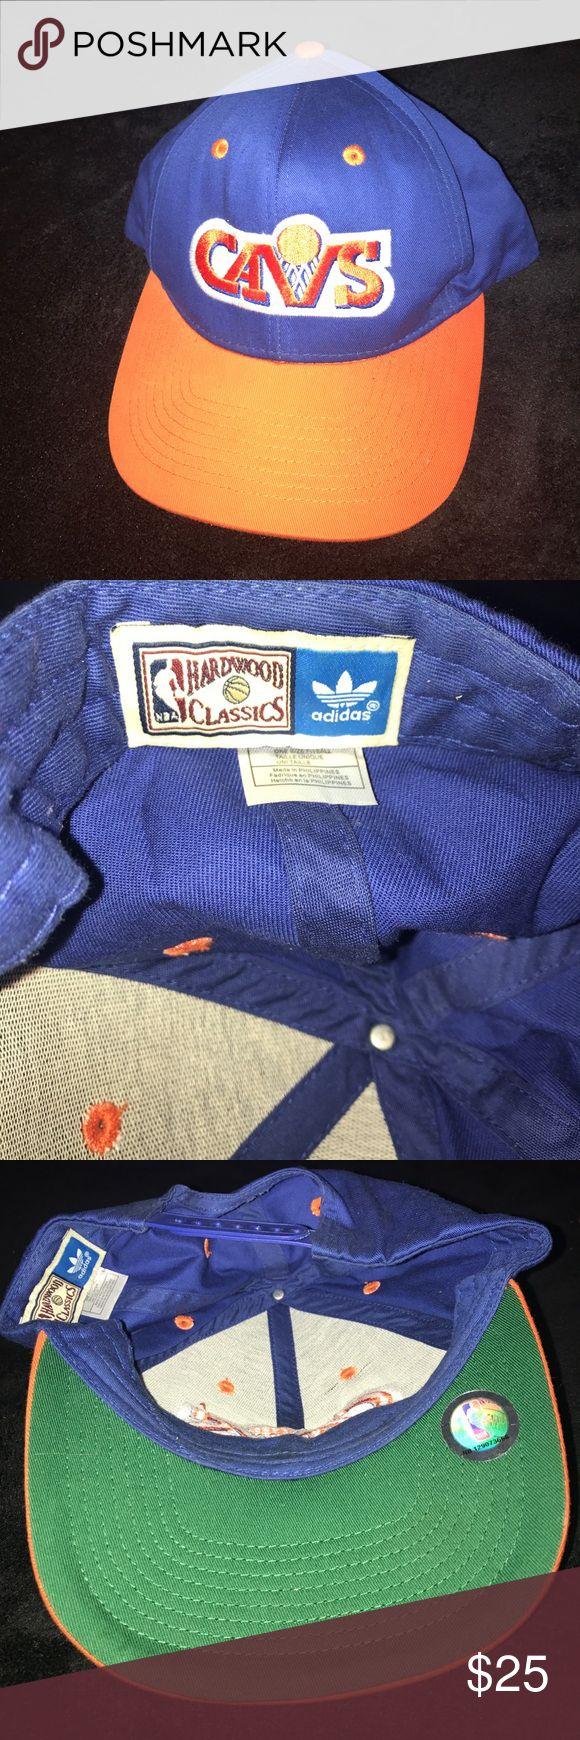 Adidas NBA Hardwood Classics Cavs SnapBack Blue/Orange with Green Bill. Cleveland Cavs SnapBack. Worn less than 3x. adidas Accessories Hats